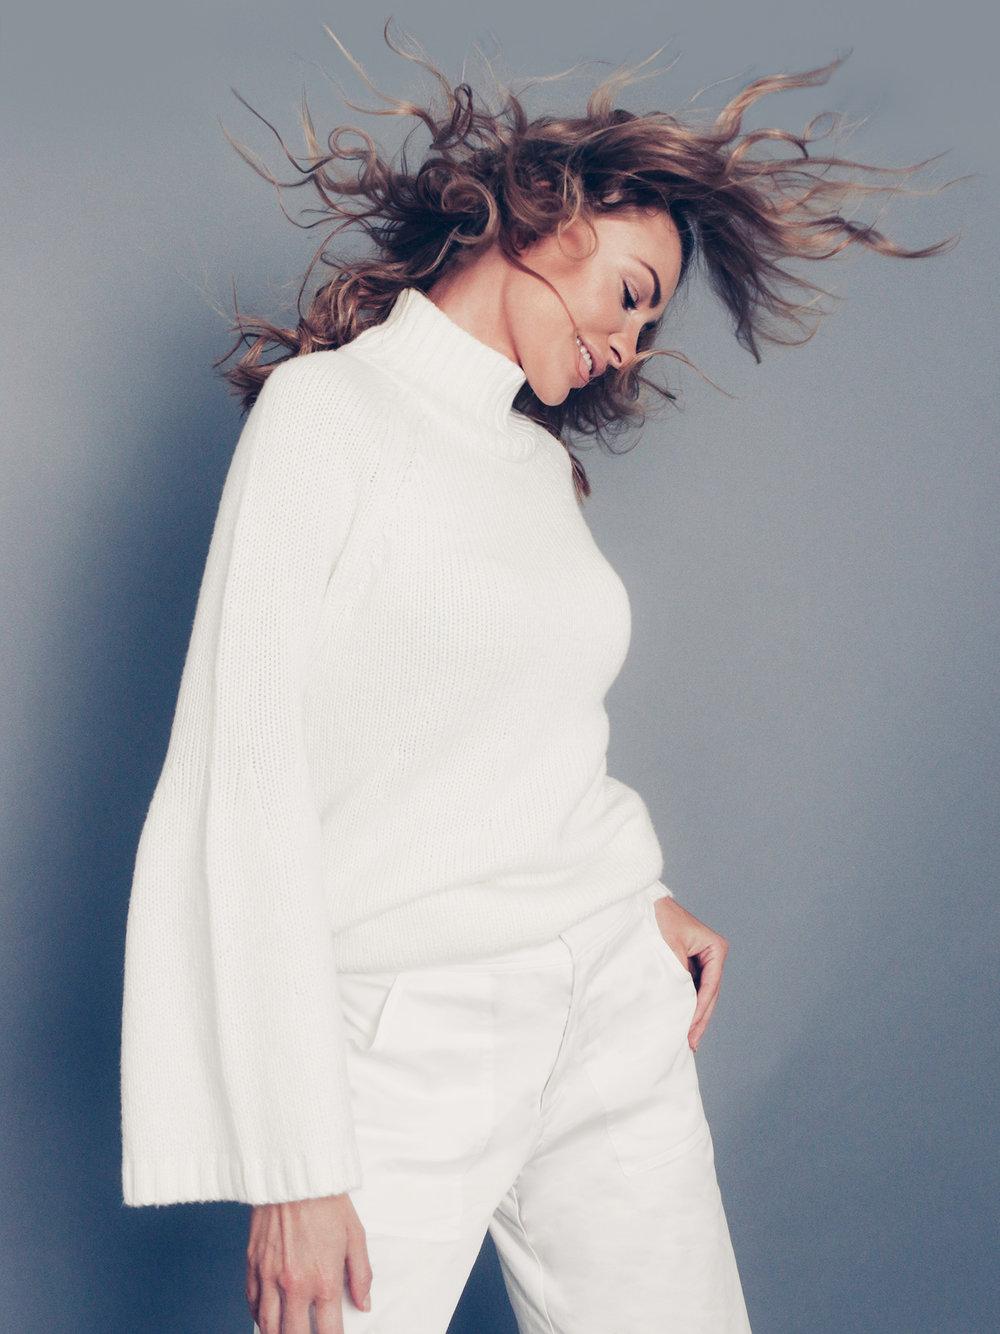 amora_beauty_studio_home_woman_fashion_model_sweater_fun_crazy_miami.jpg